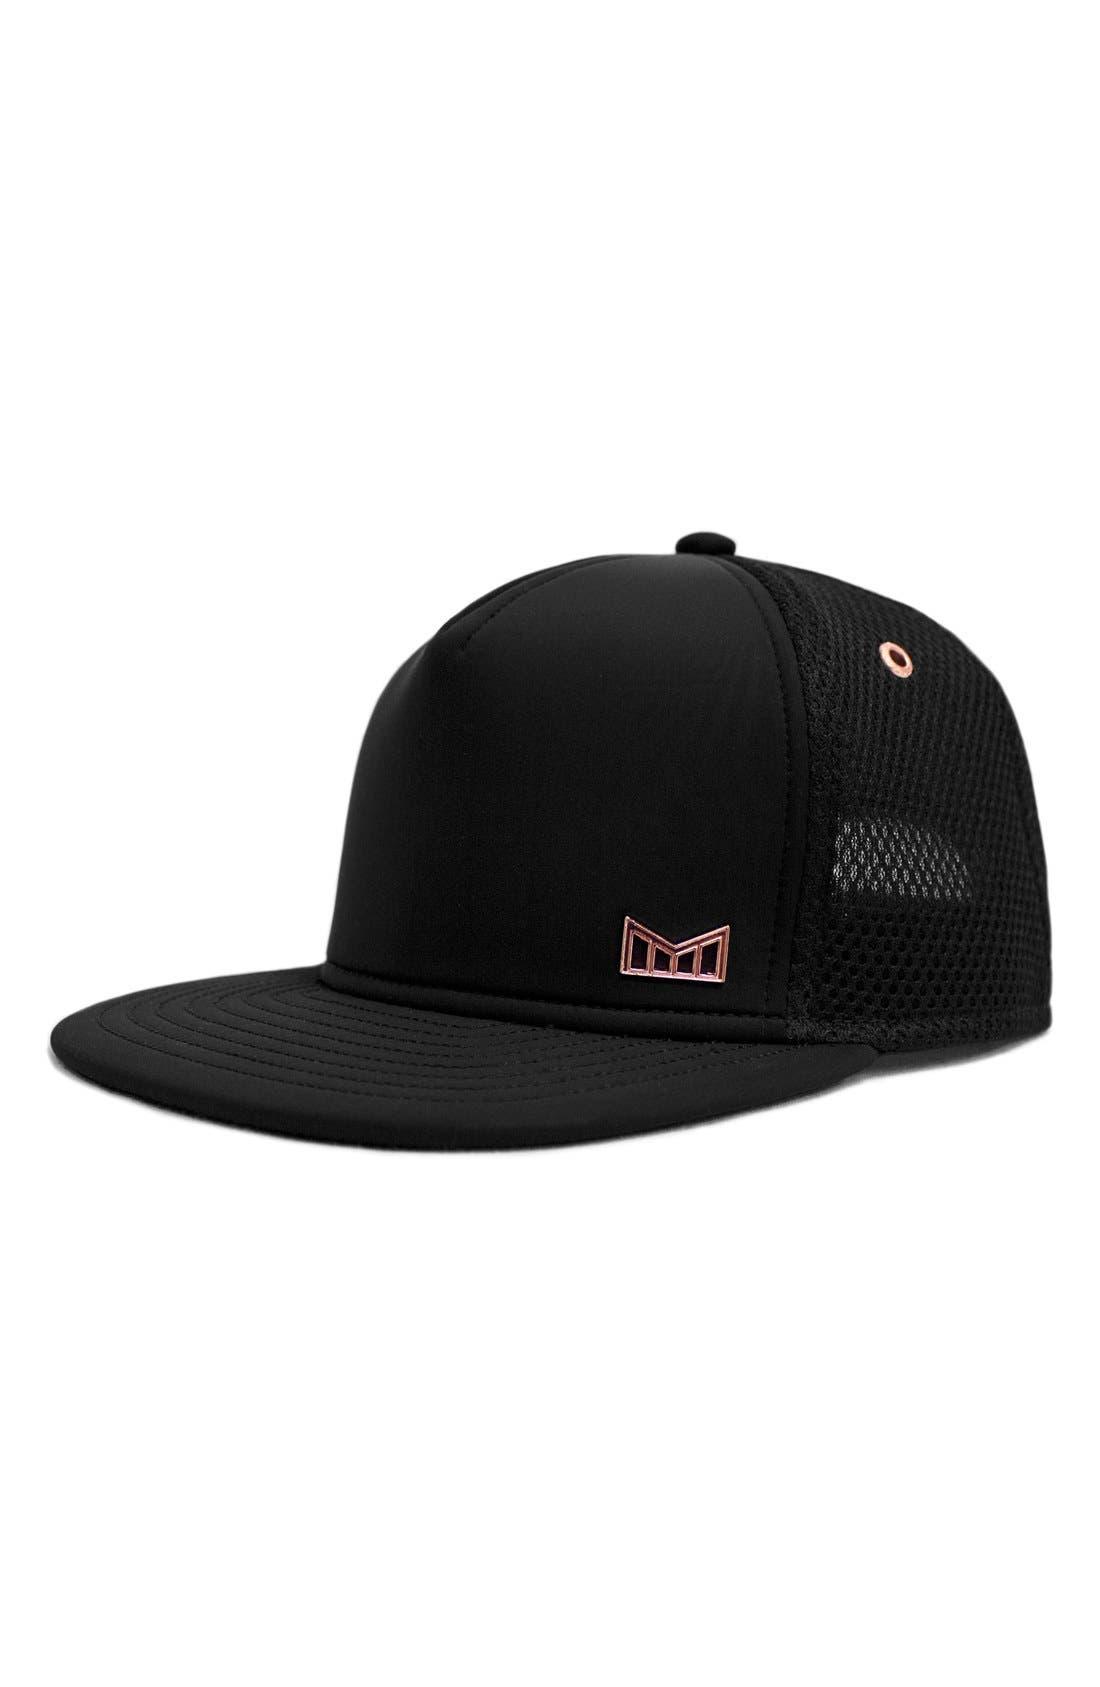 'The Majesty' Mesh Back Snapback Hat,                             Main thumbnail 1, color,                             BLACK